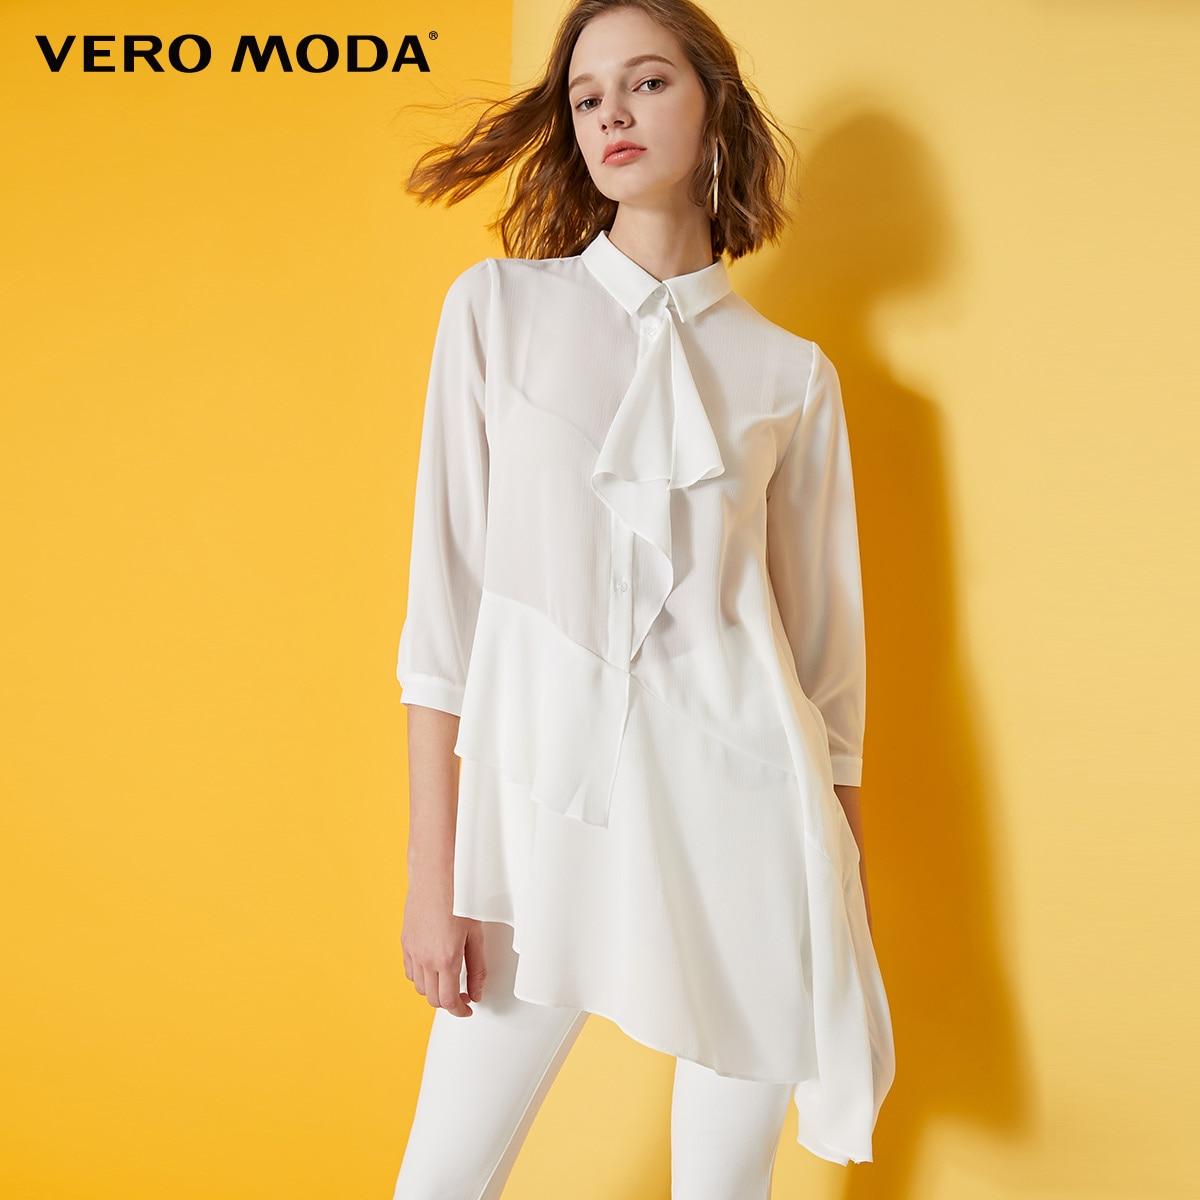 Vero Moda Women's Mid-length Ruffled Turn-down Collar Chiffon Tops Blouse | 319158524